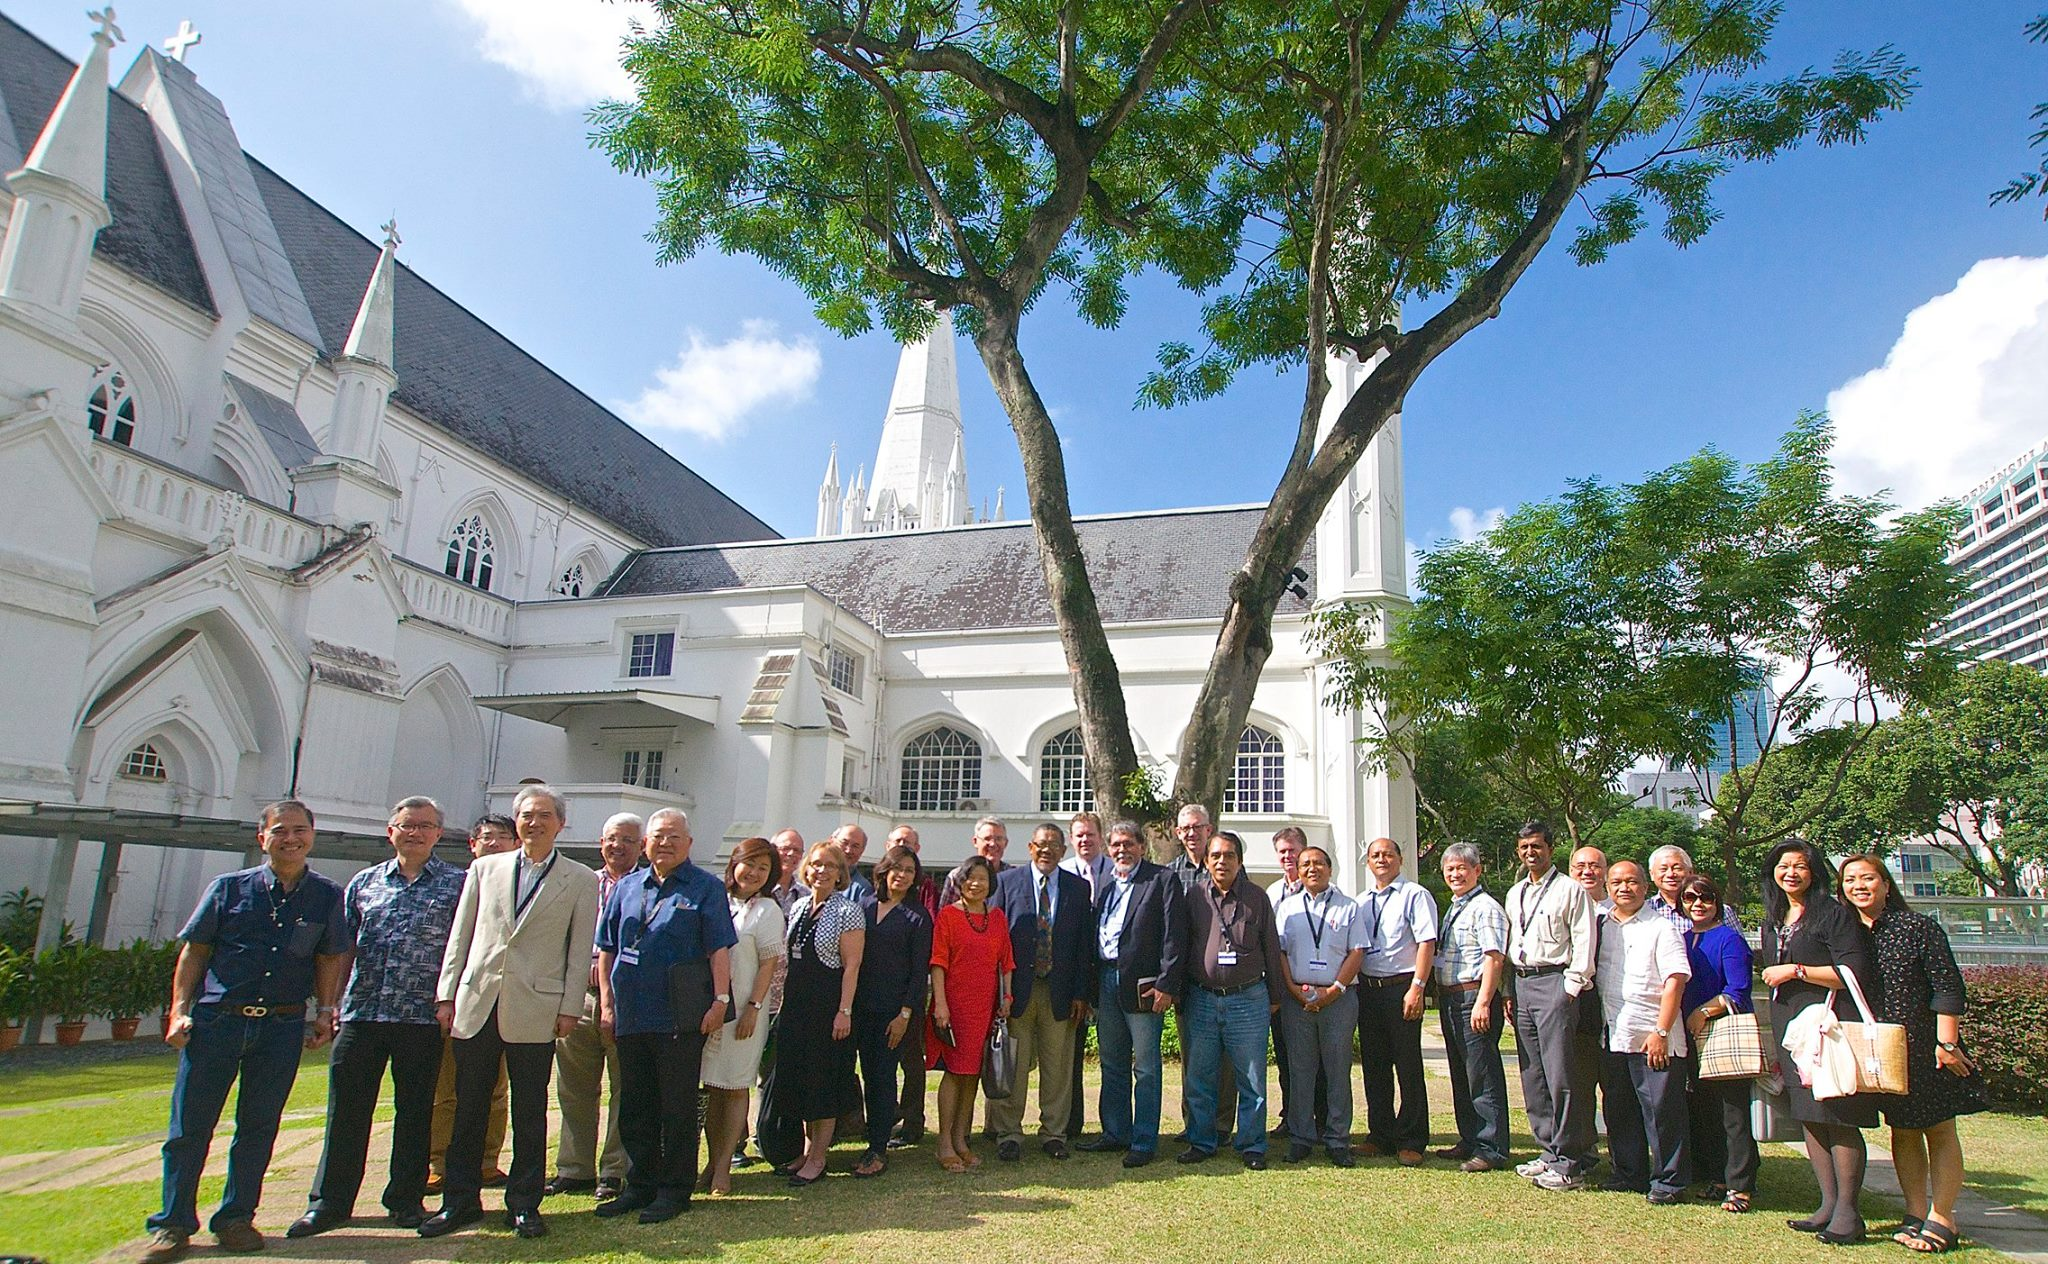 singapore group photo